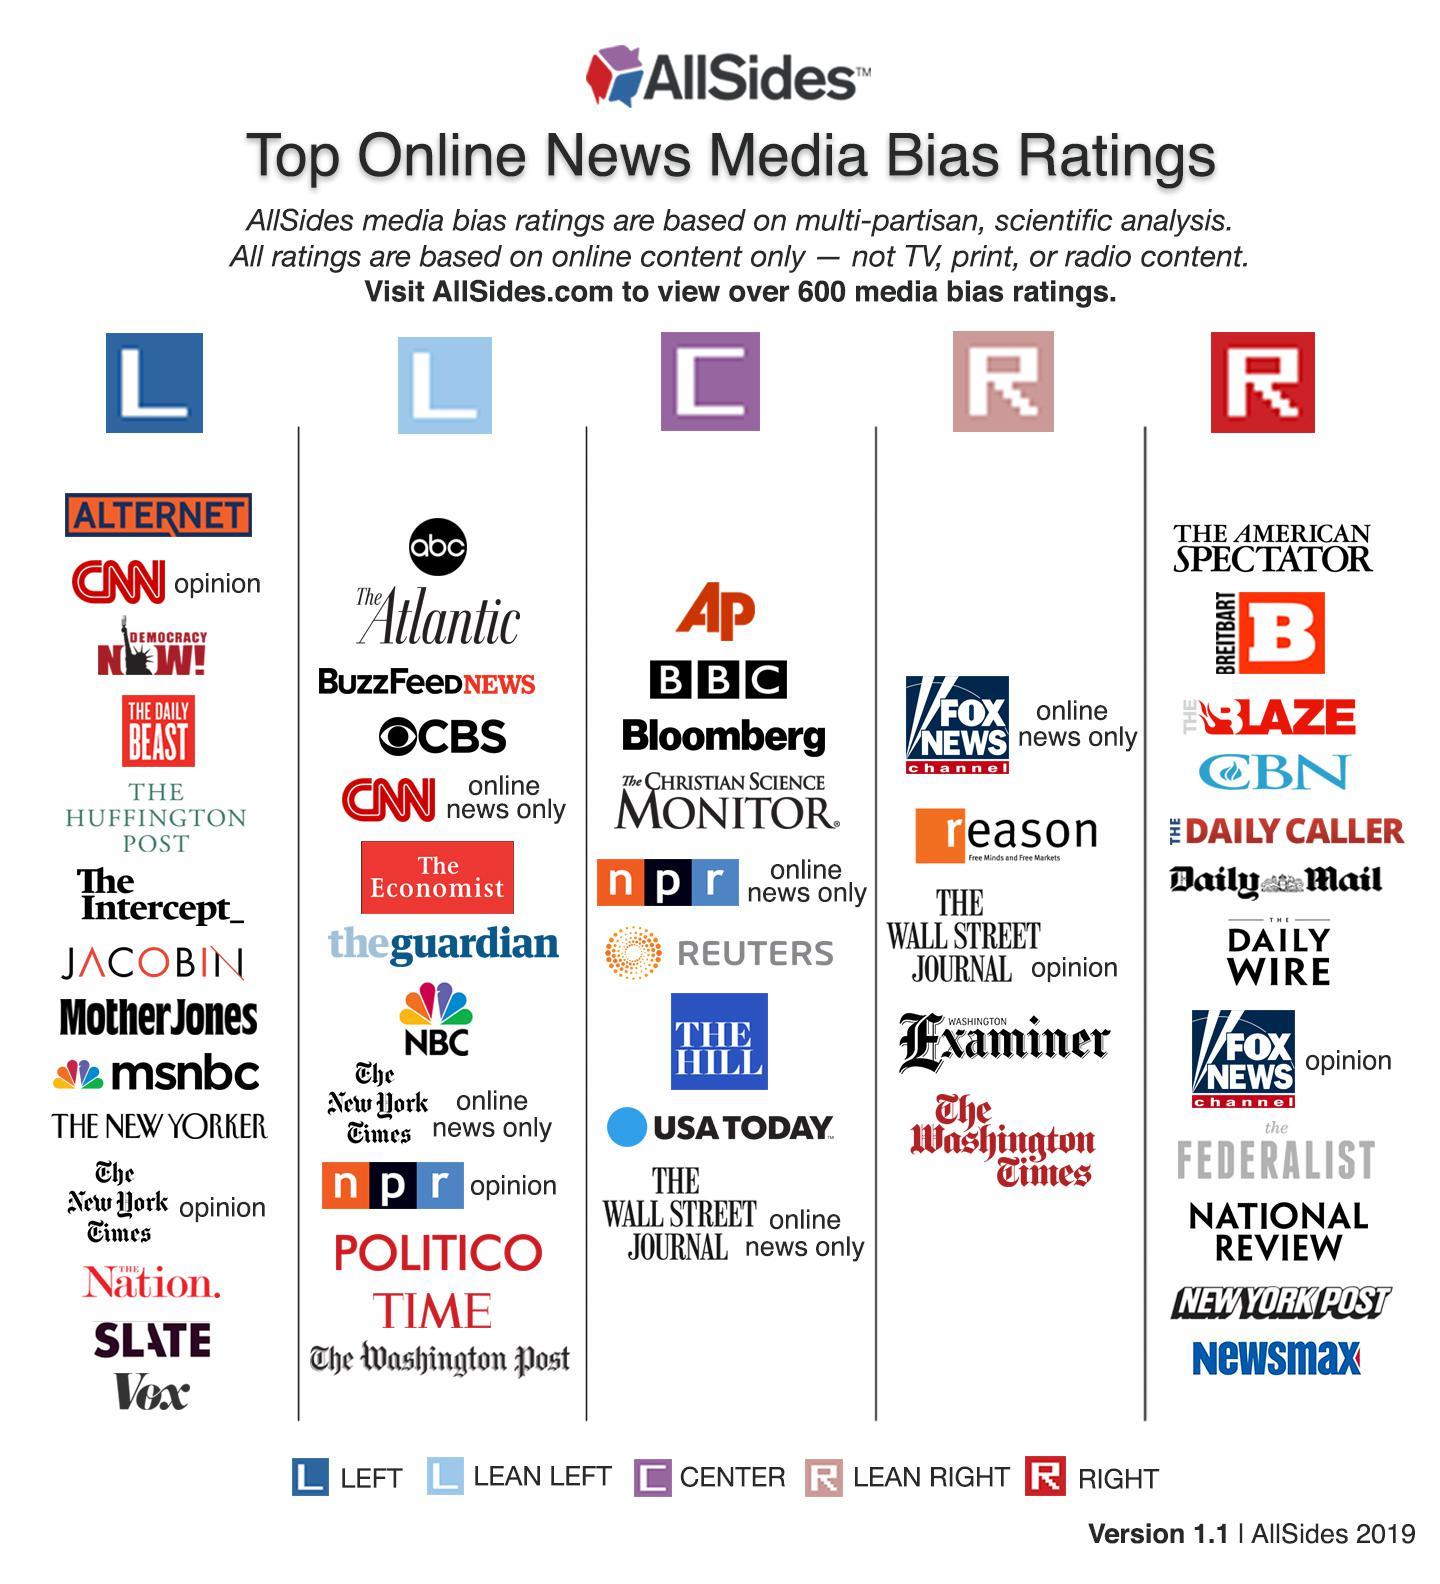 The Top Online News Media Bias Ratings Of Major